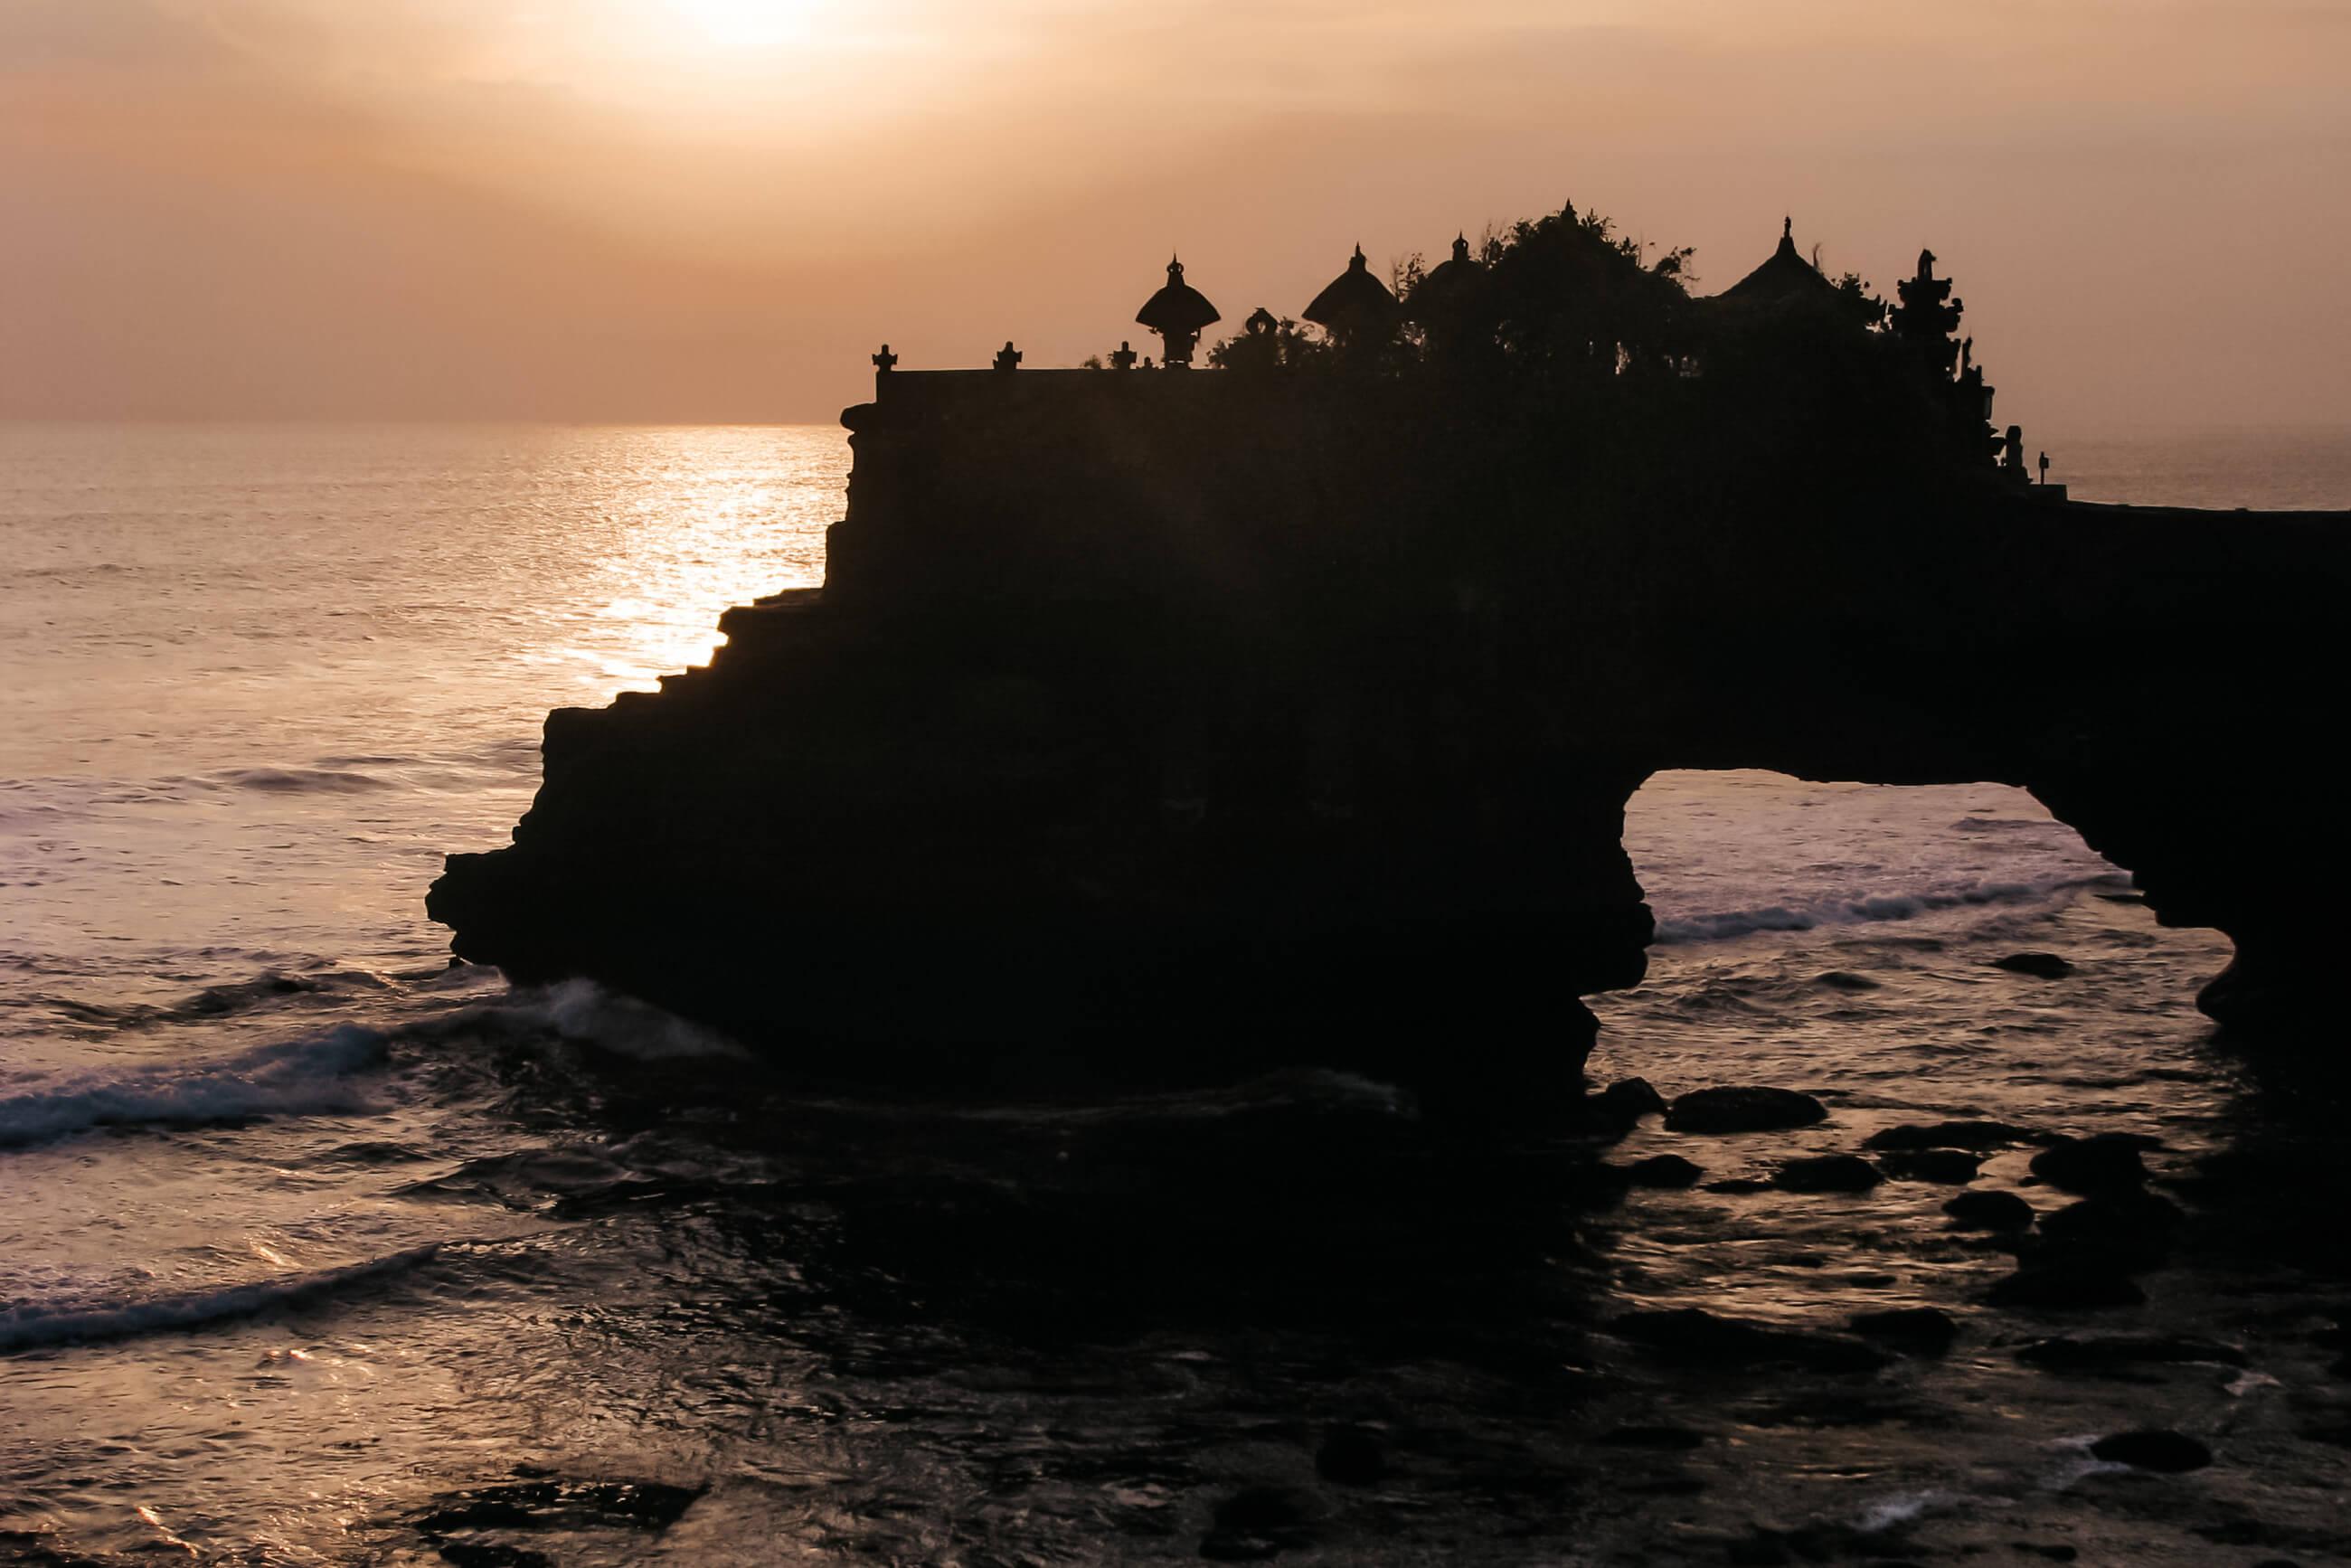 https://bubo.sk/uploads/galleries/7542/jozefharvanek_indonezia_bali_314-chram-tanah-lot-26.jpg